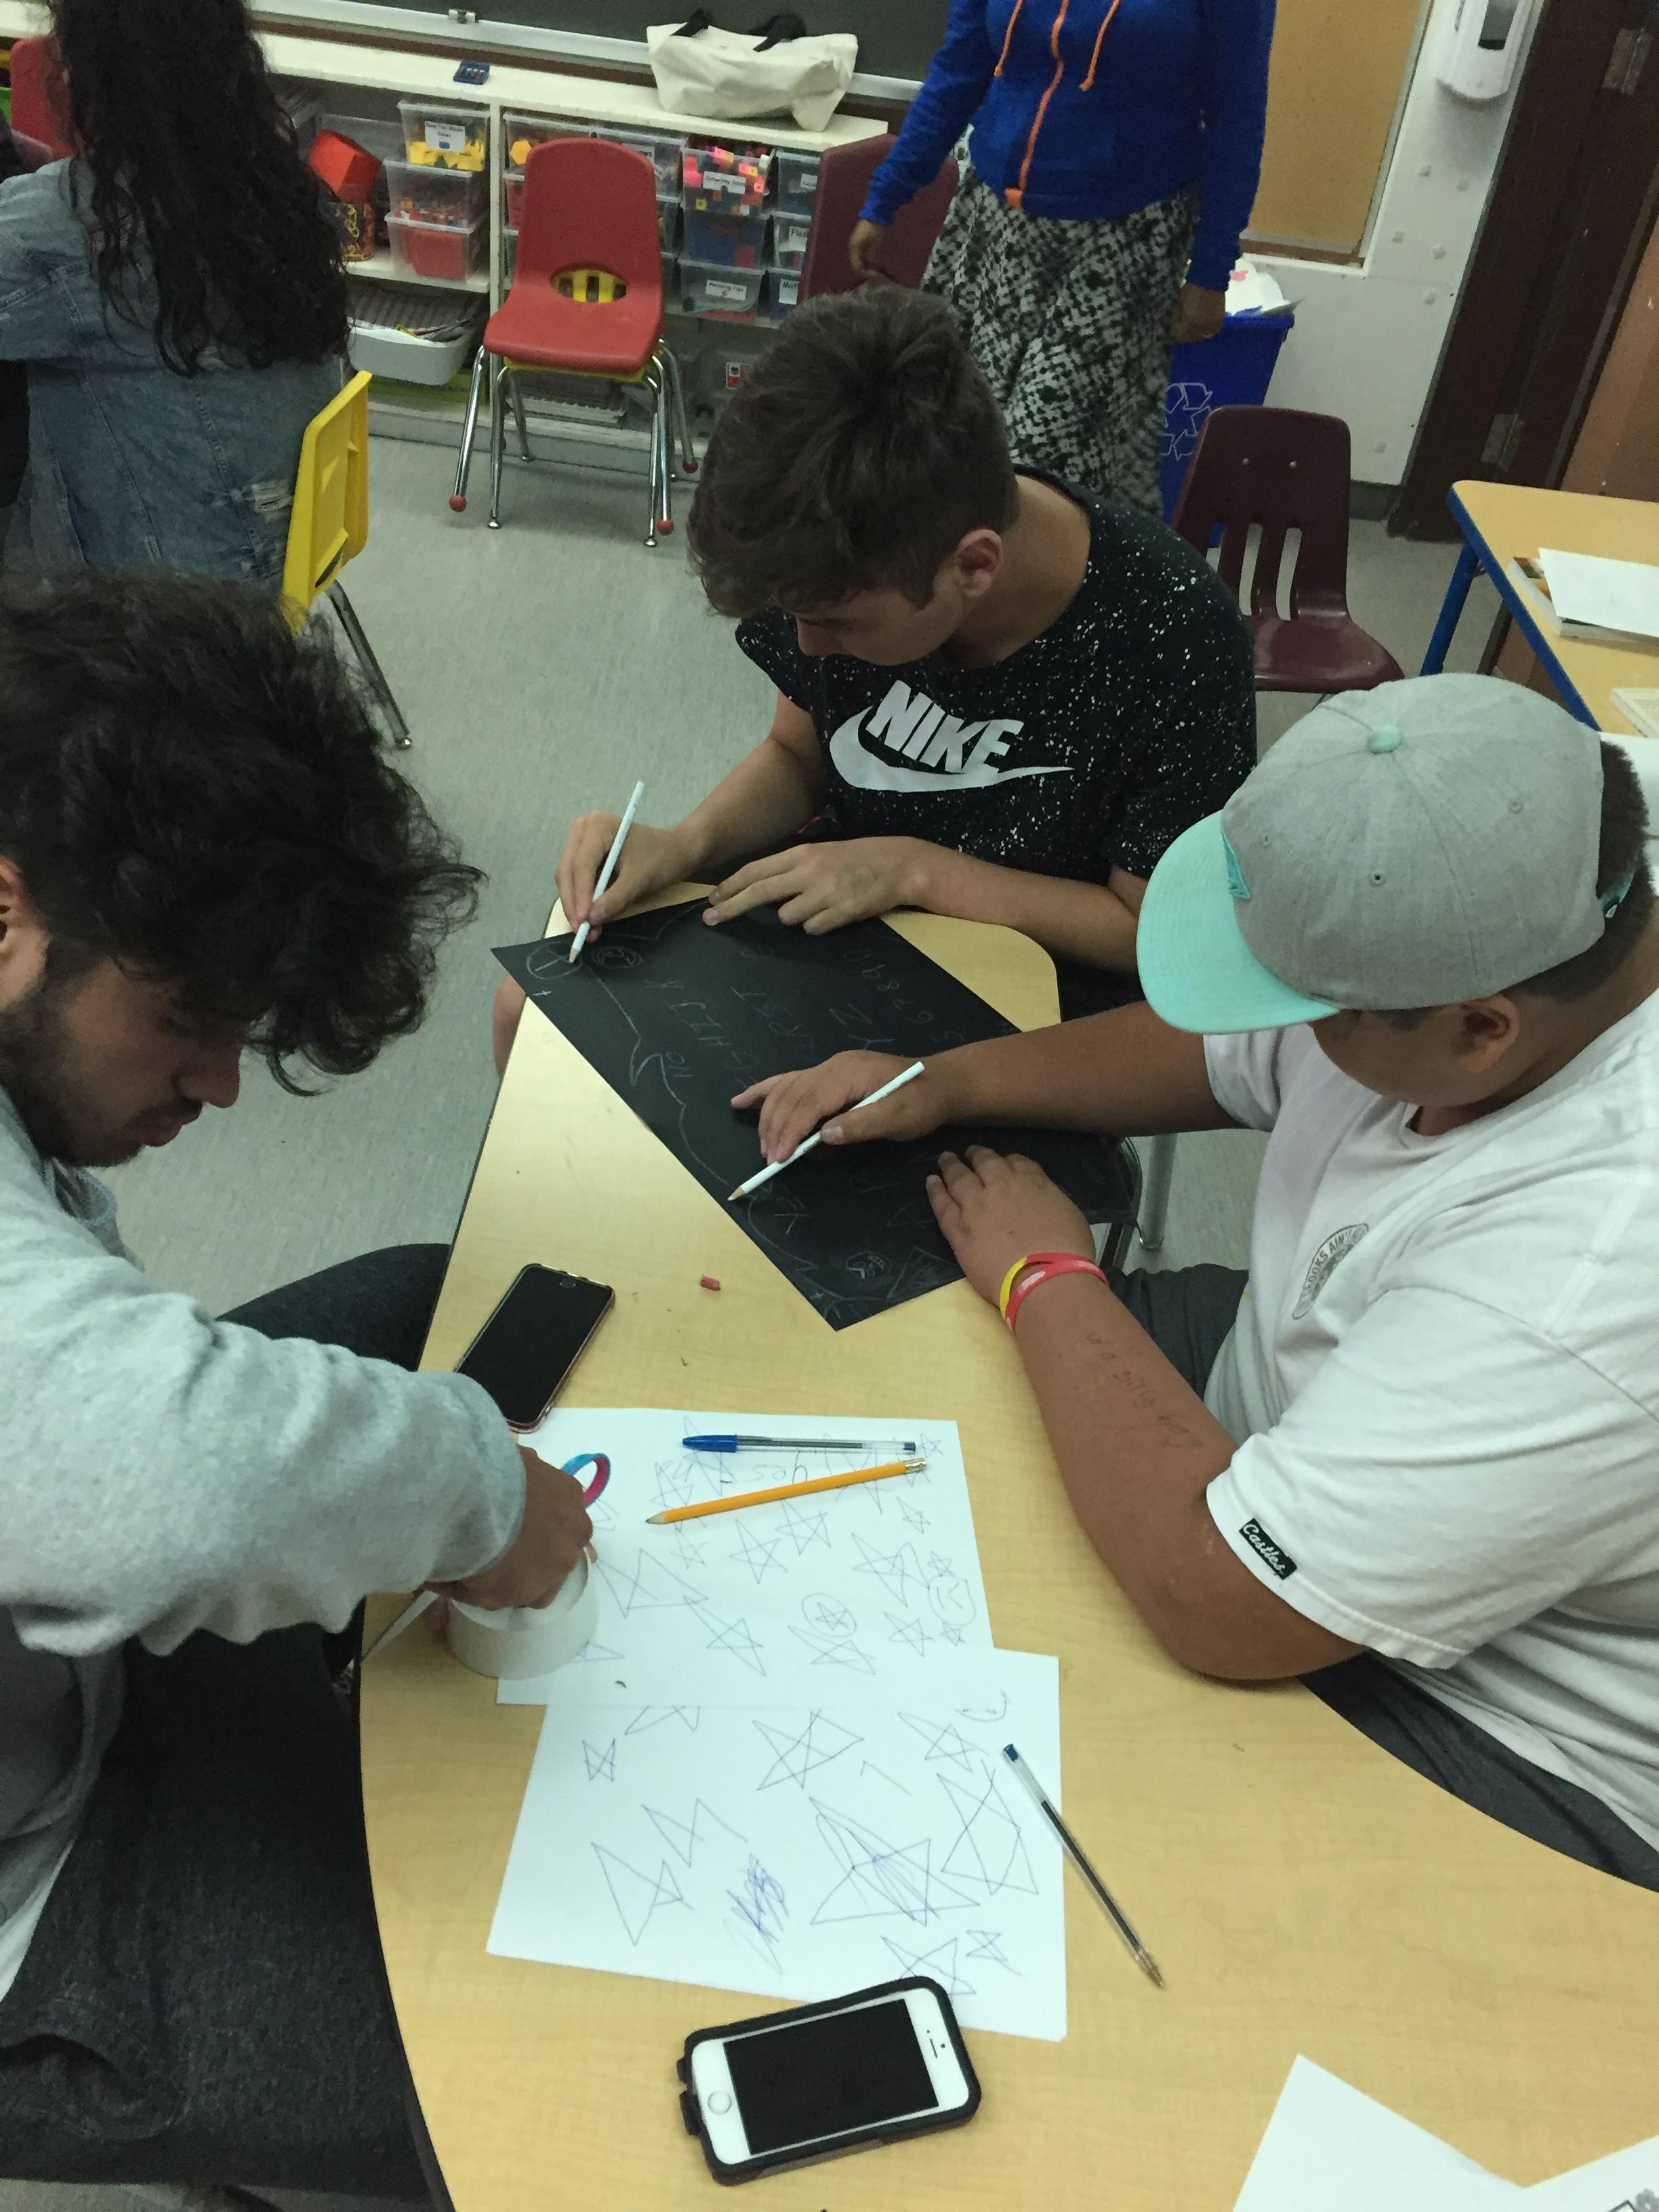 Dorian, Gabe and Cylus create their ouija board